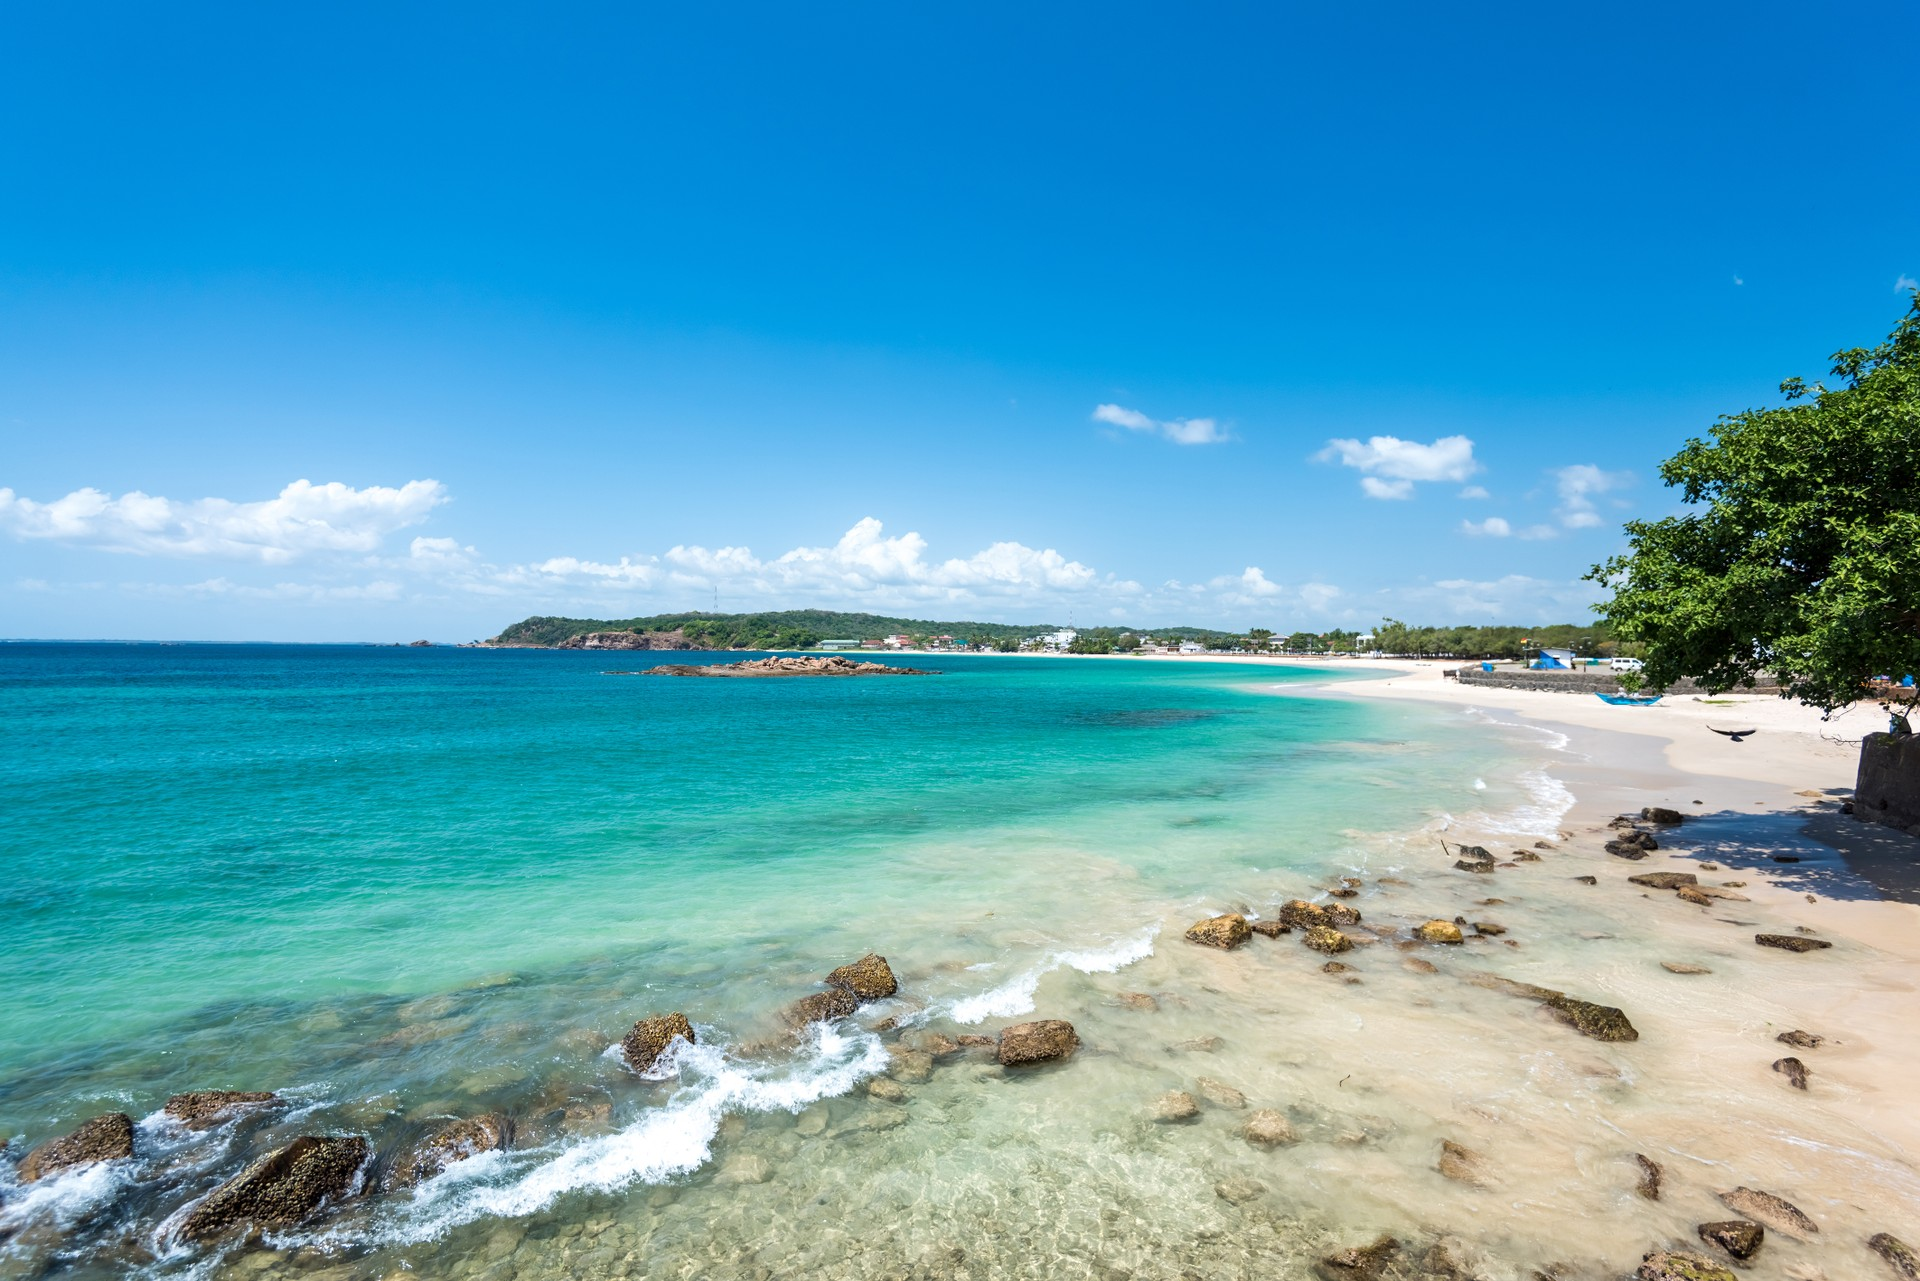 Sri Lanka holidays: Trincomalee beach